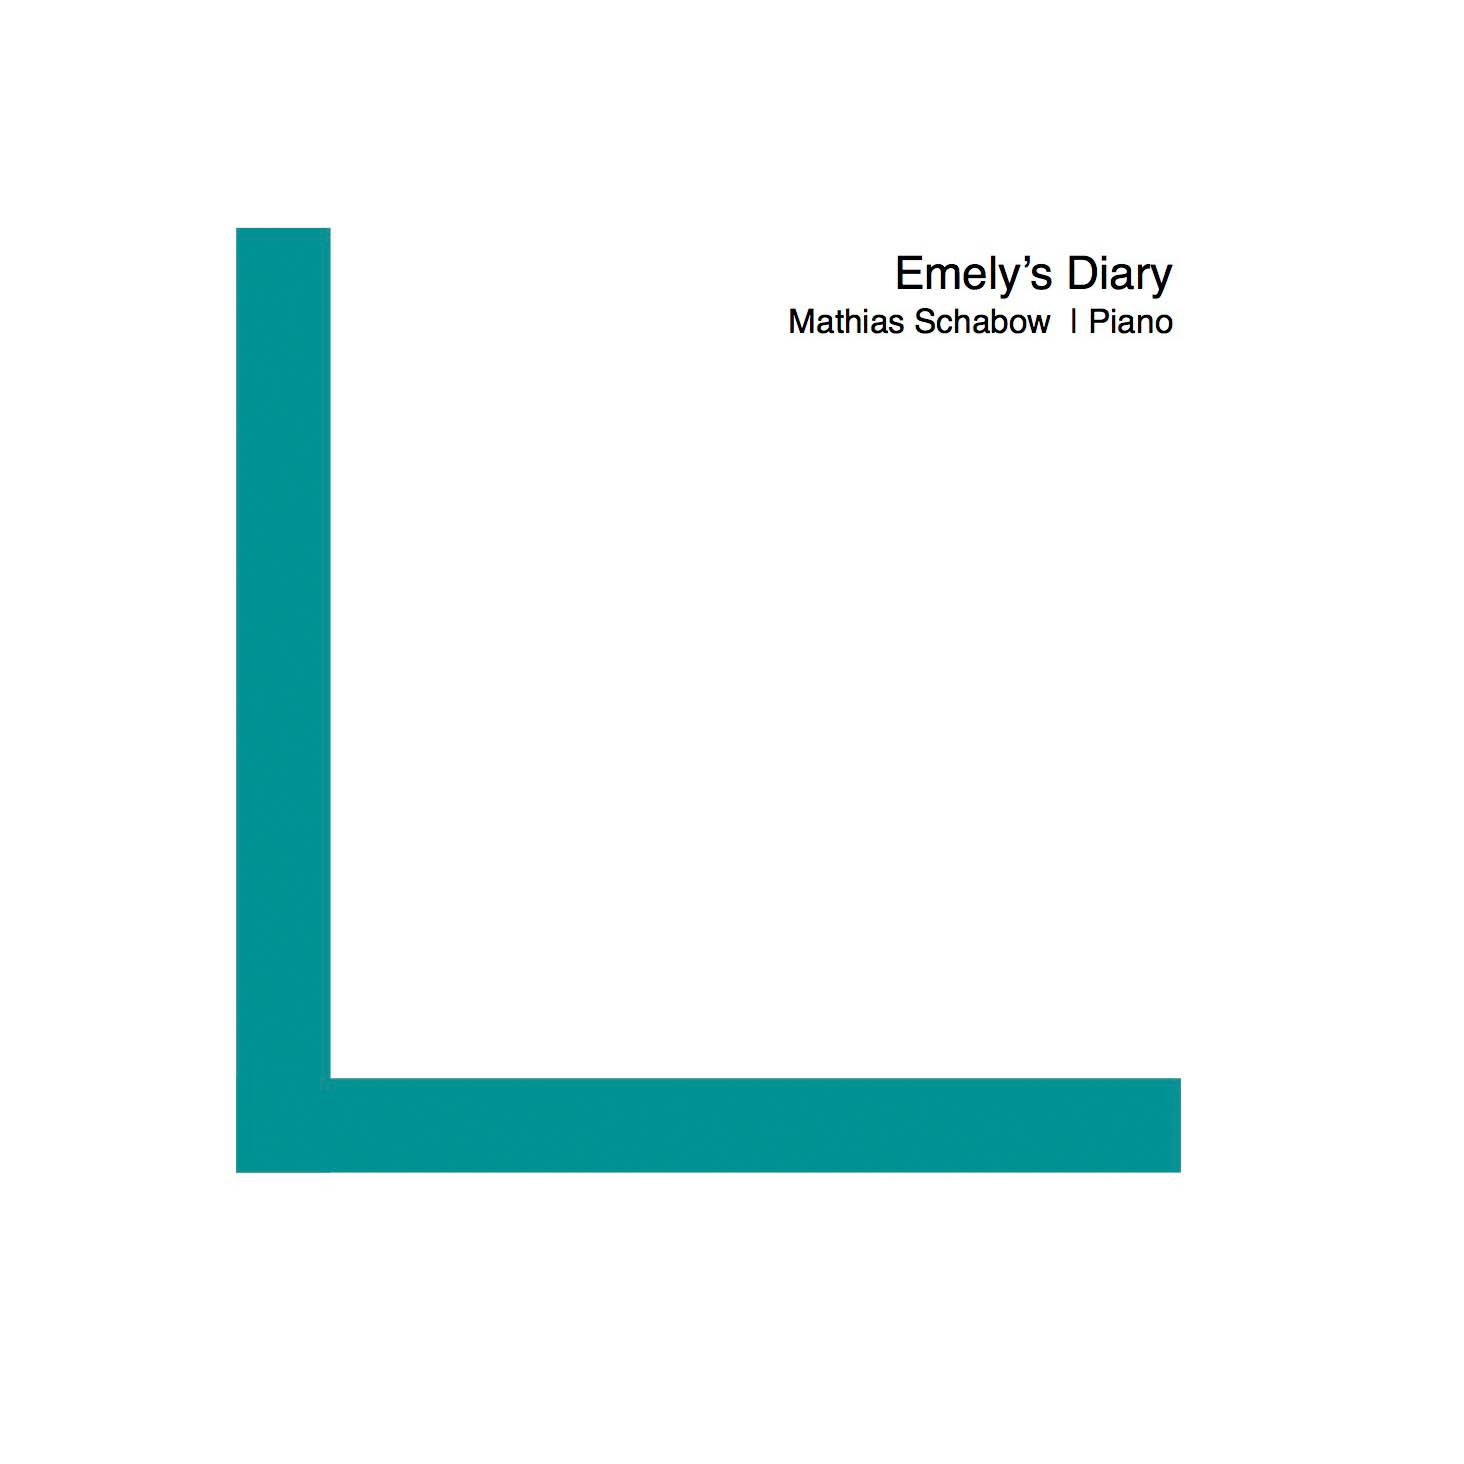 Emely's Diary - Mathias Schabow | Piano